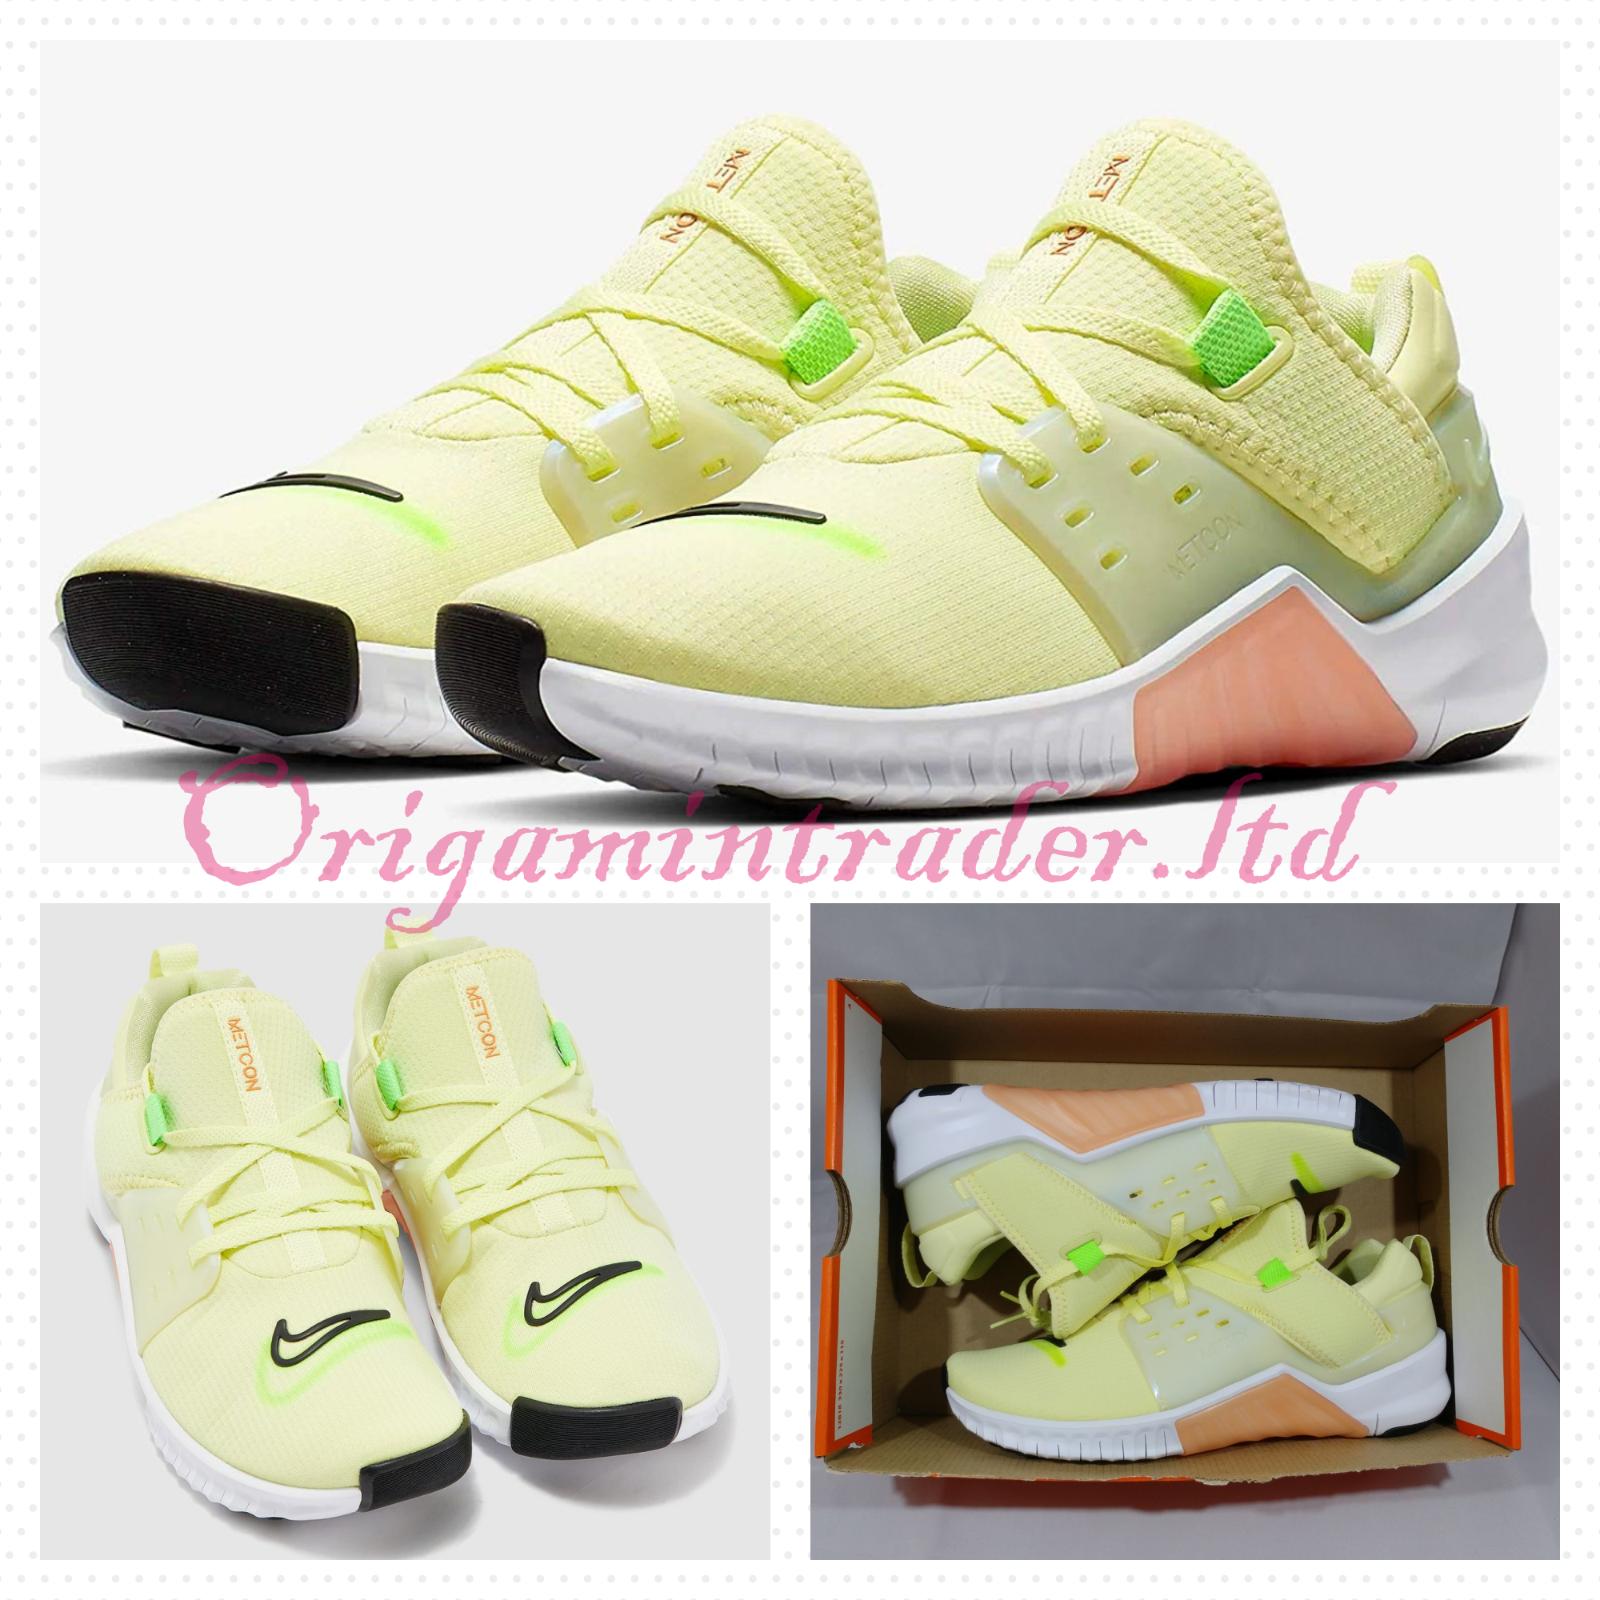 Nike Wmns Free Metcon 2 AMP 'Luminous Grün' CI1753-301